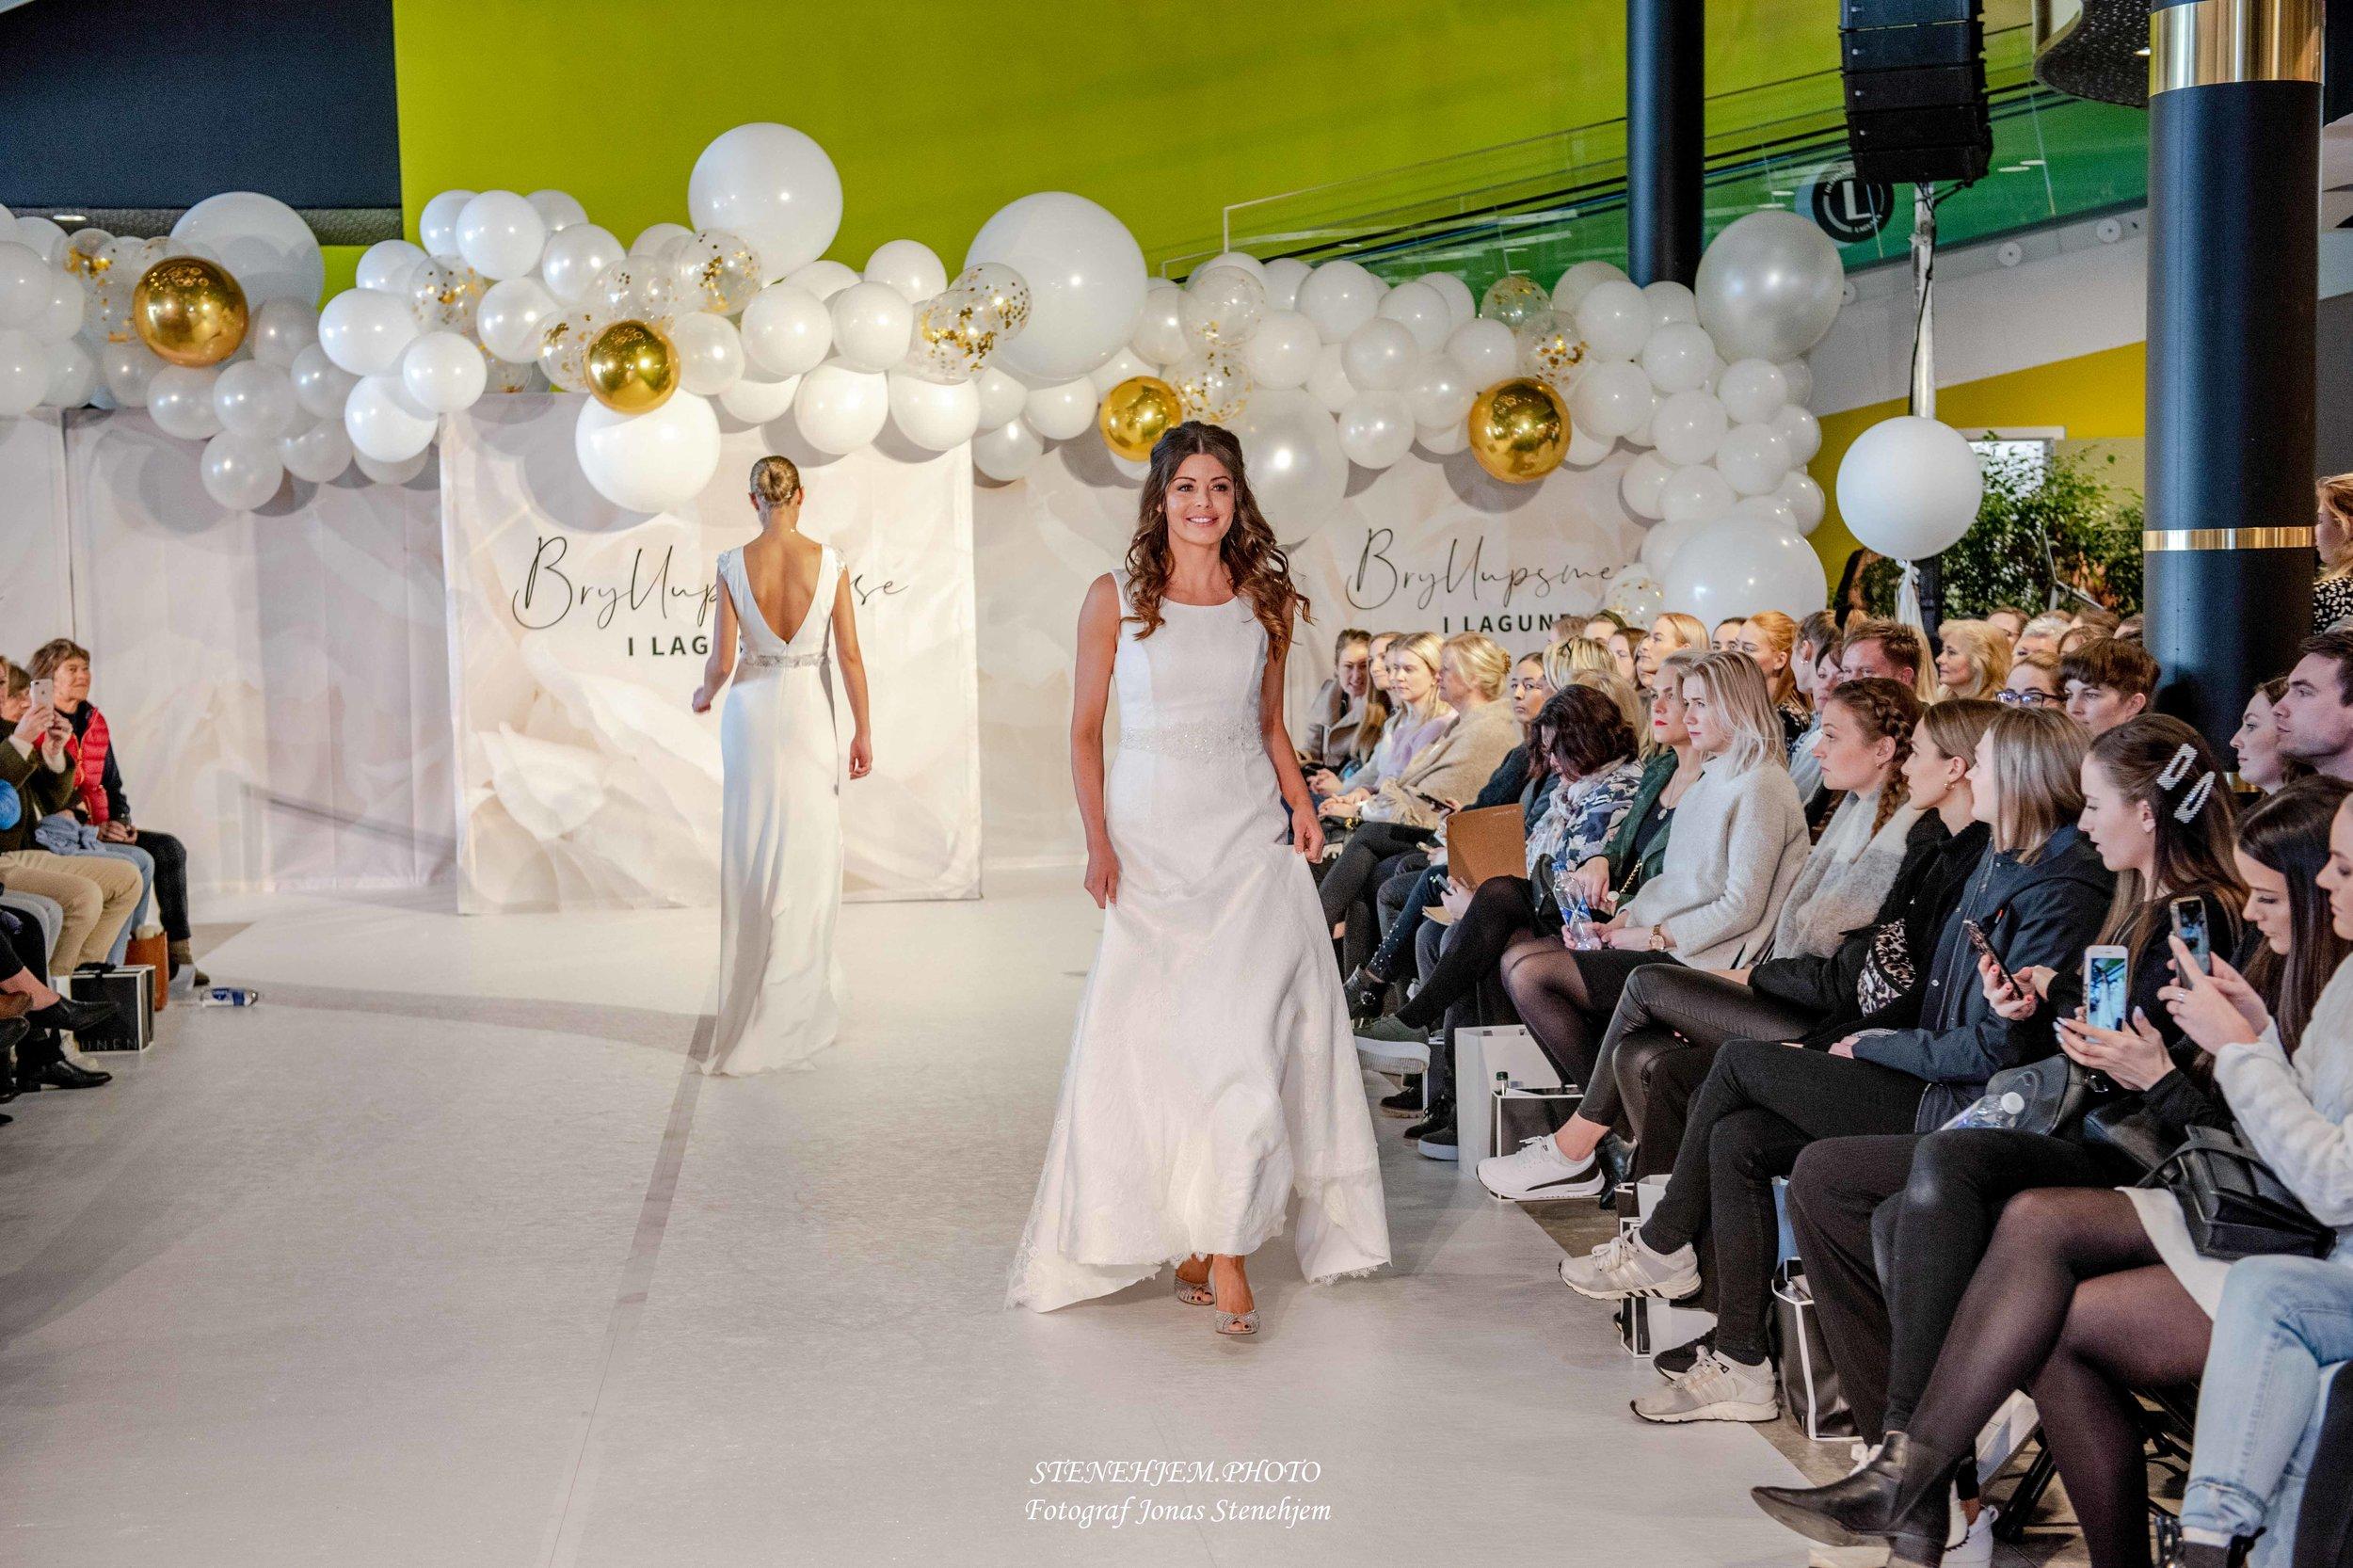 Bryllupsmesse_Lagunen_mittaltweddingfair__043.jpg